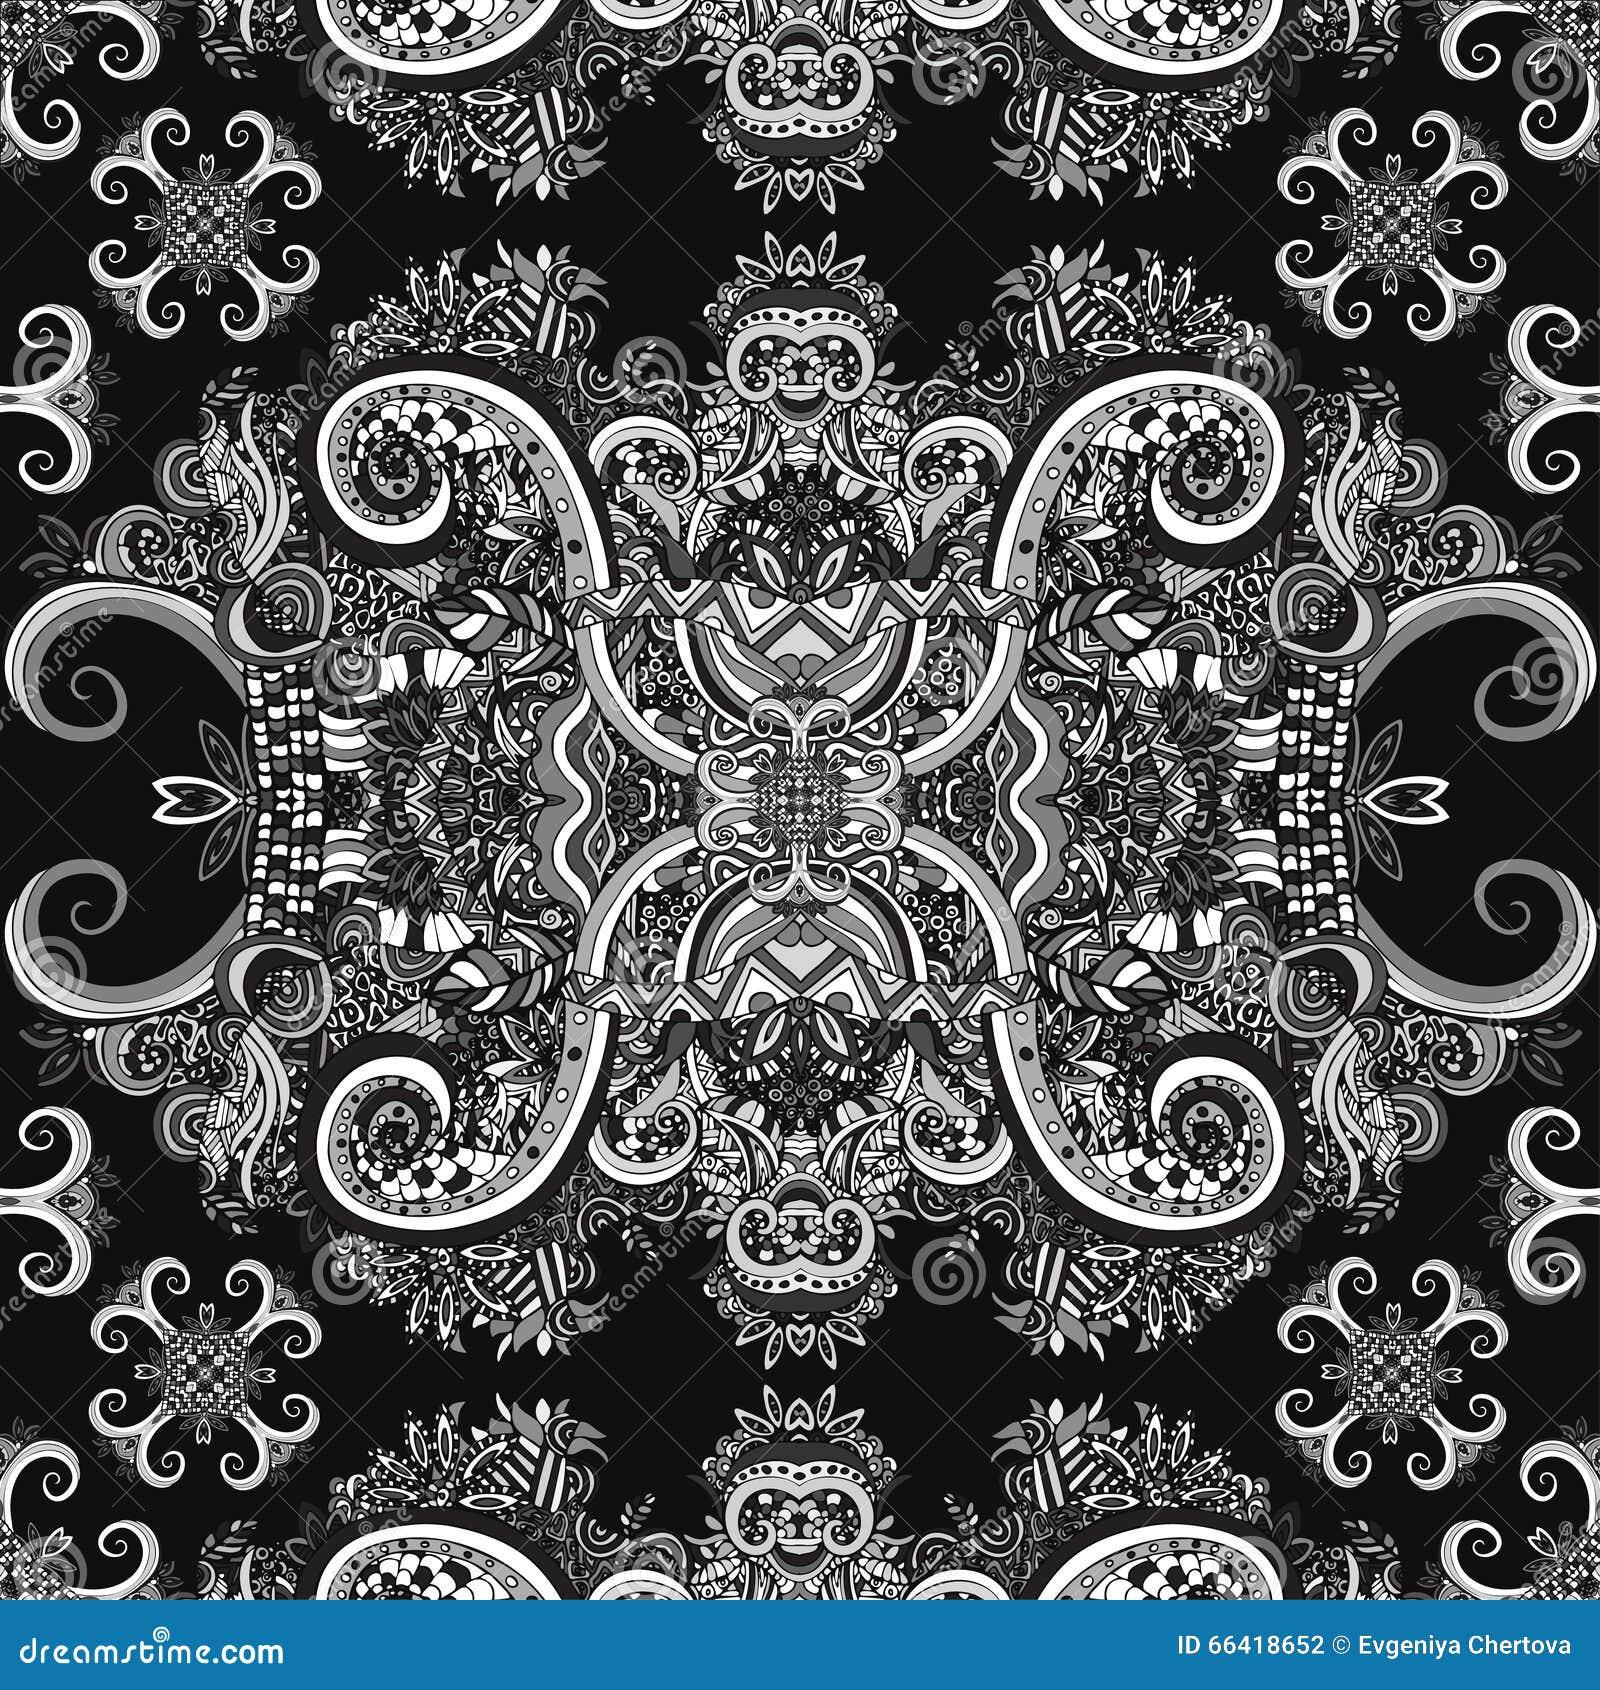 Boho Ornament Texture Monochrome Ethnic Black And White